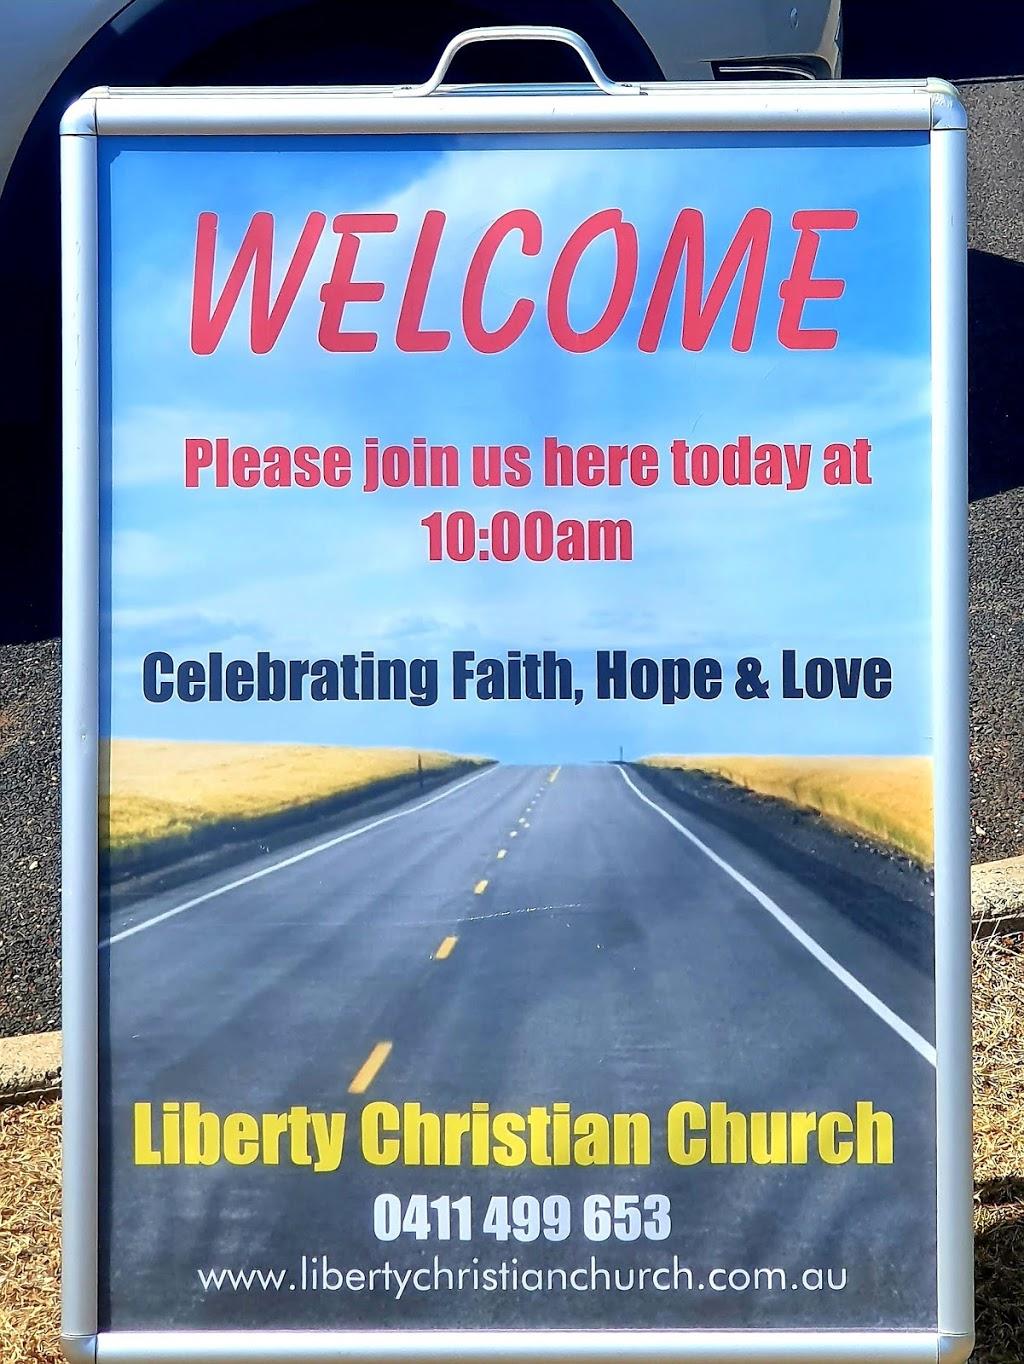 Liberty Christian Church | church | 60 Oliver St, Inverell NSW 2360, Australia | 0411499653 OR +61 411 499 653